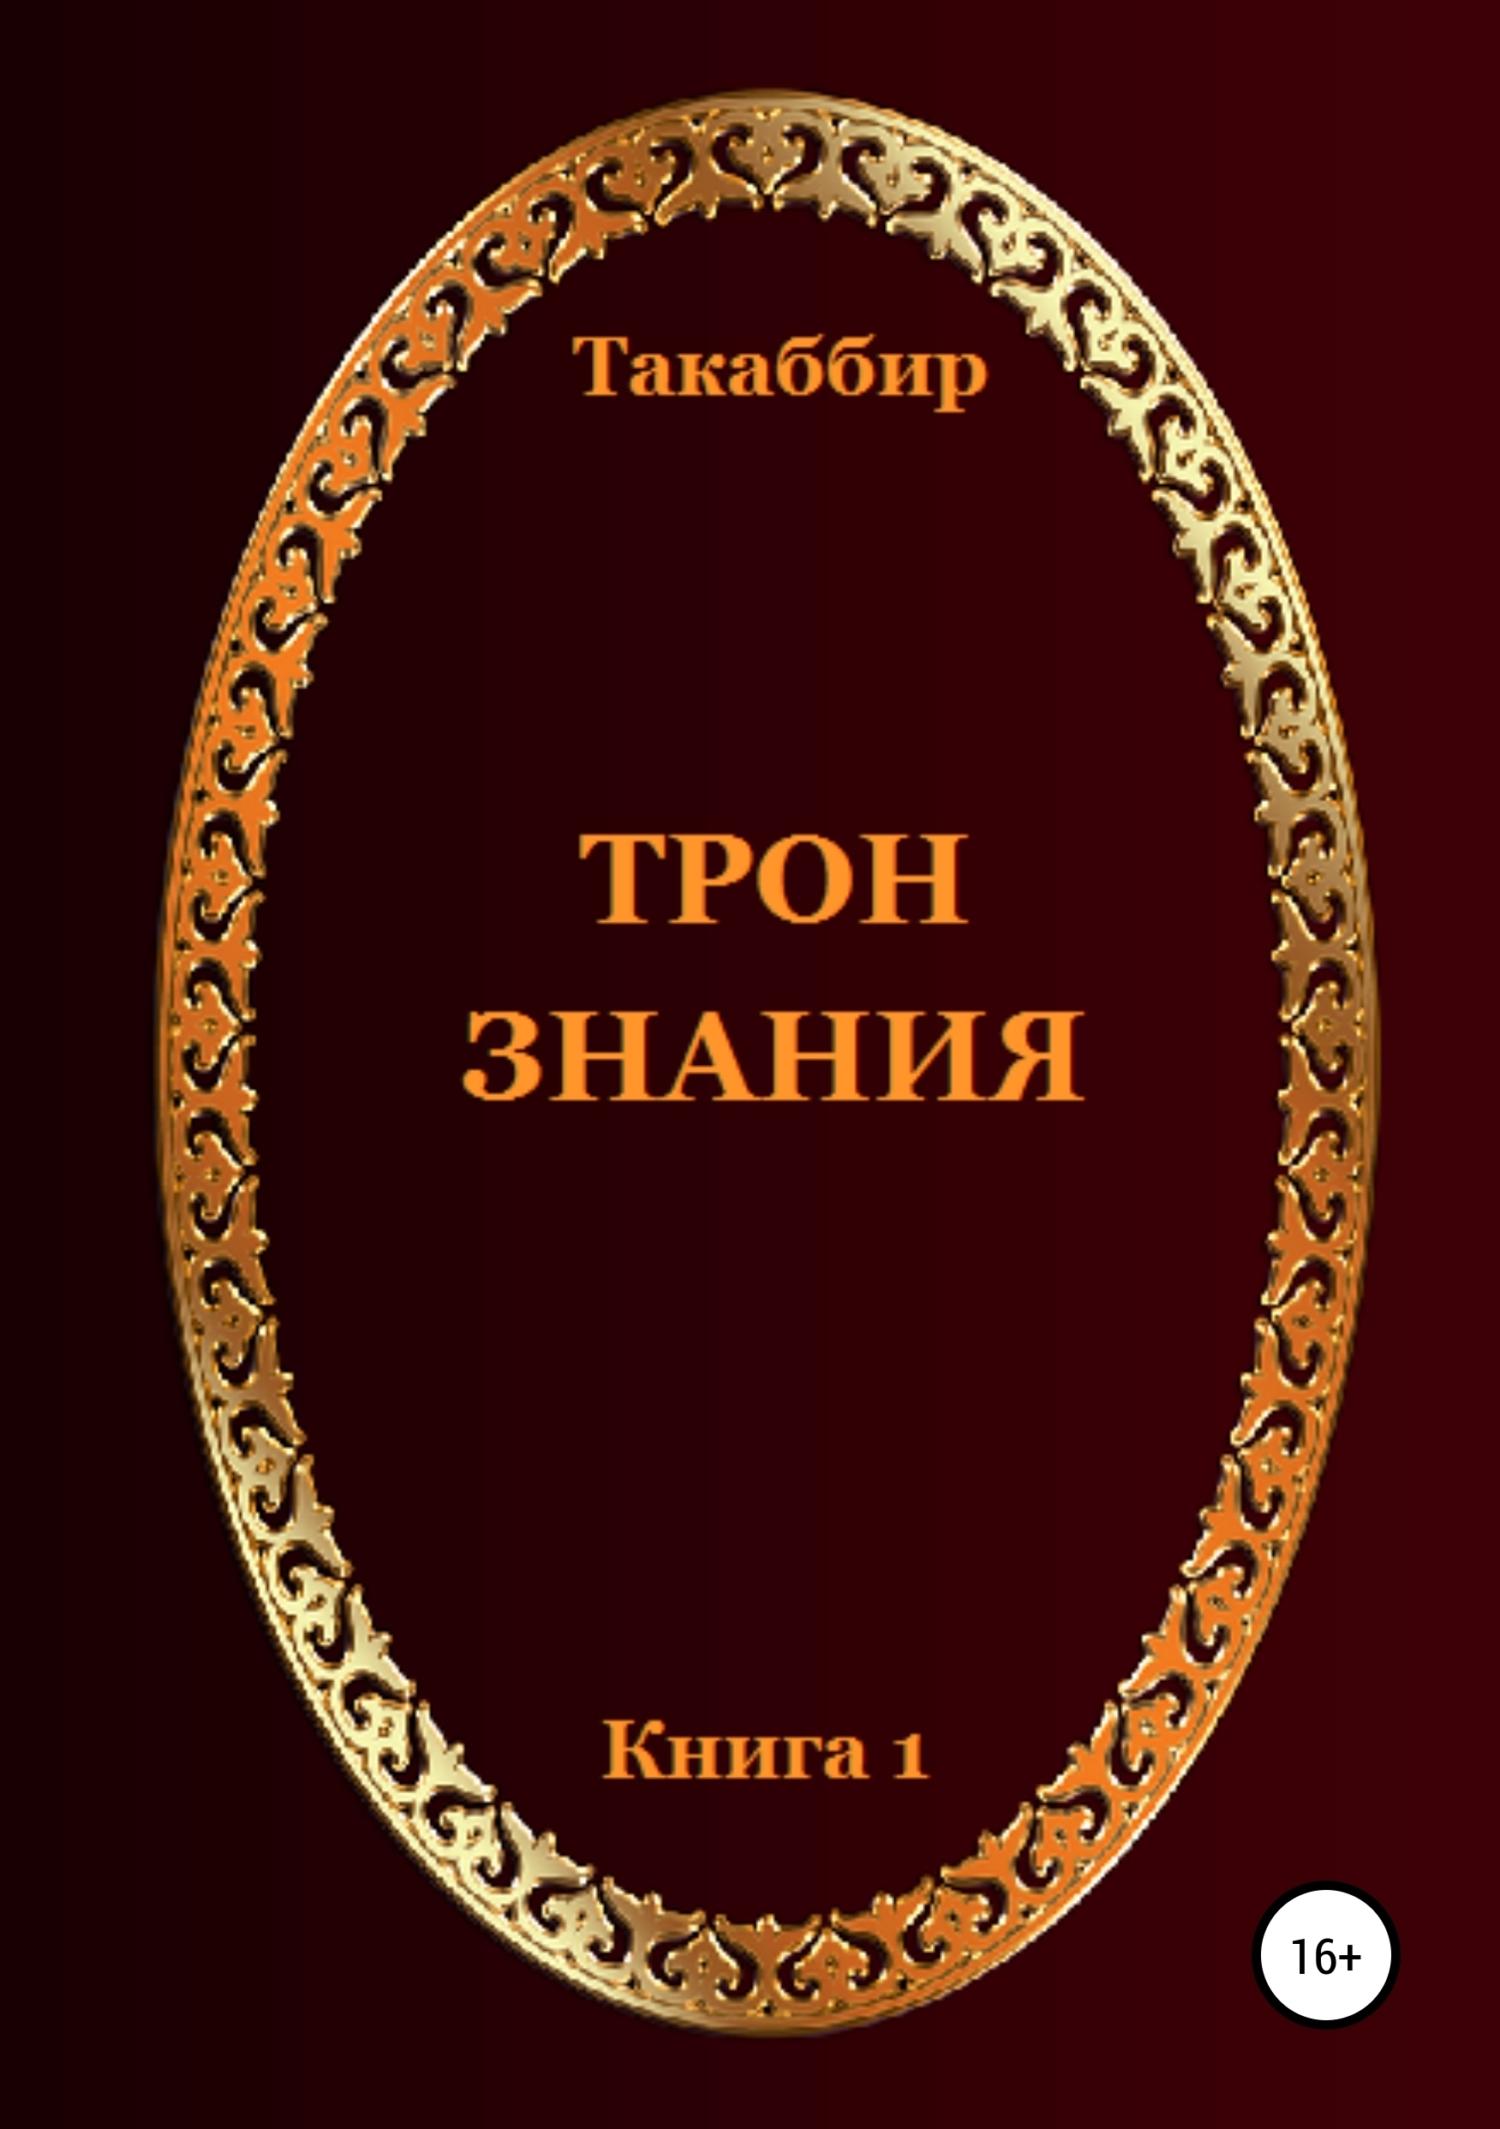 Такаббир Эль Кебади Трон Знания. Книга 1